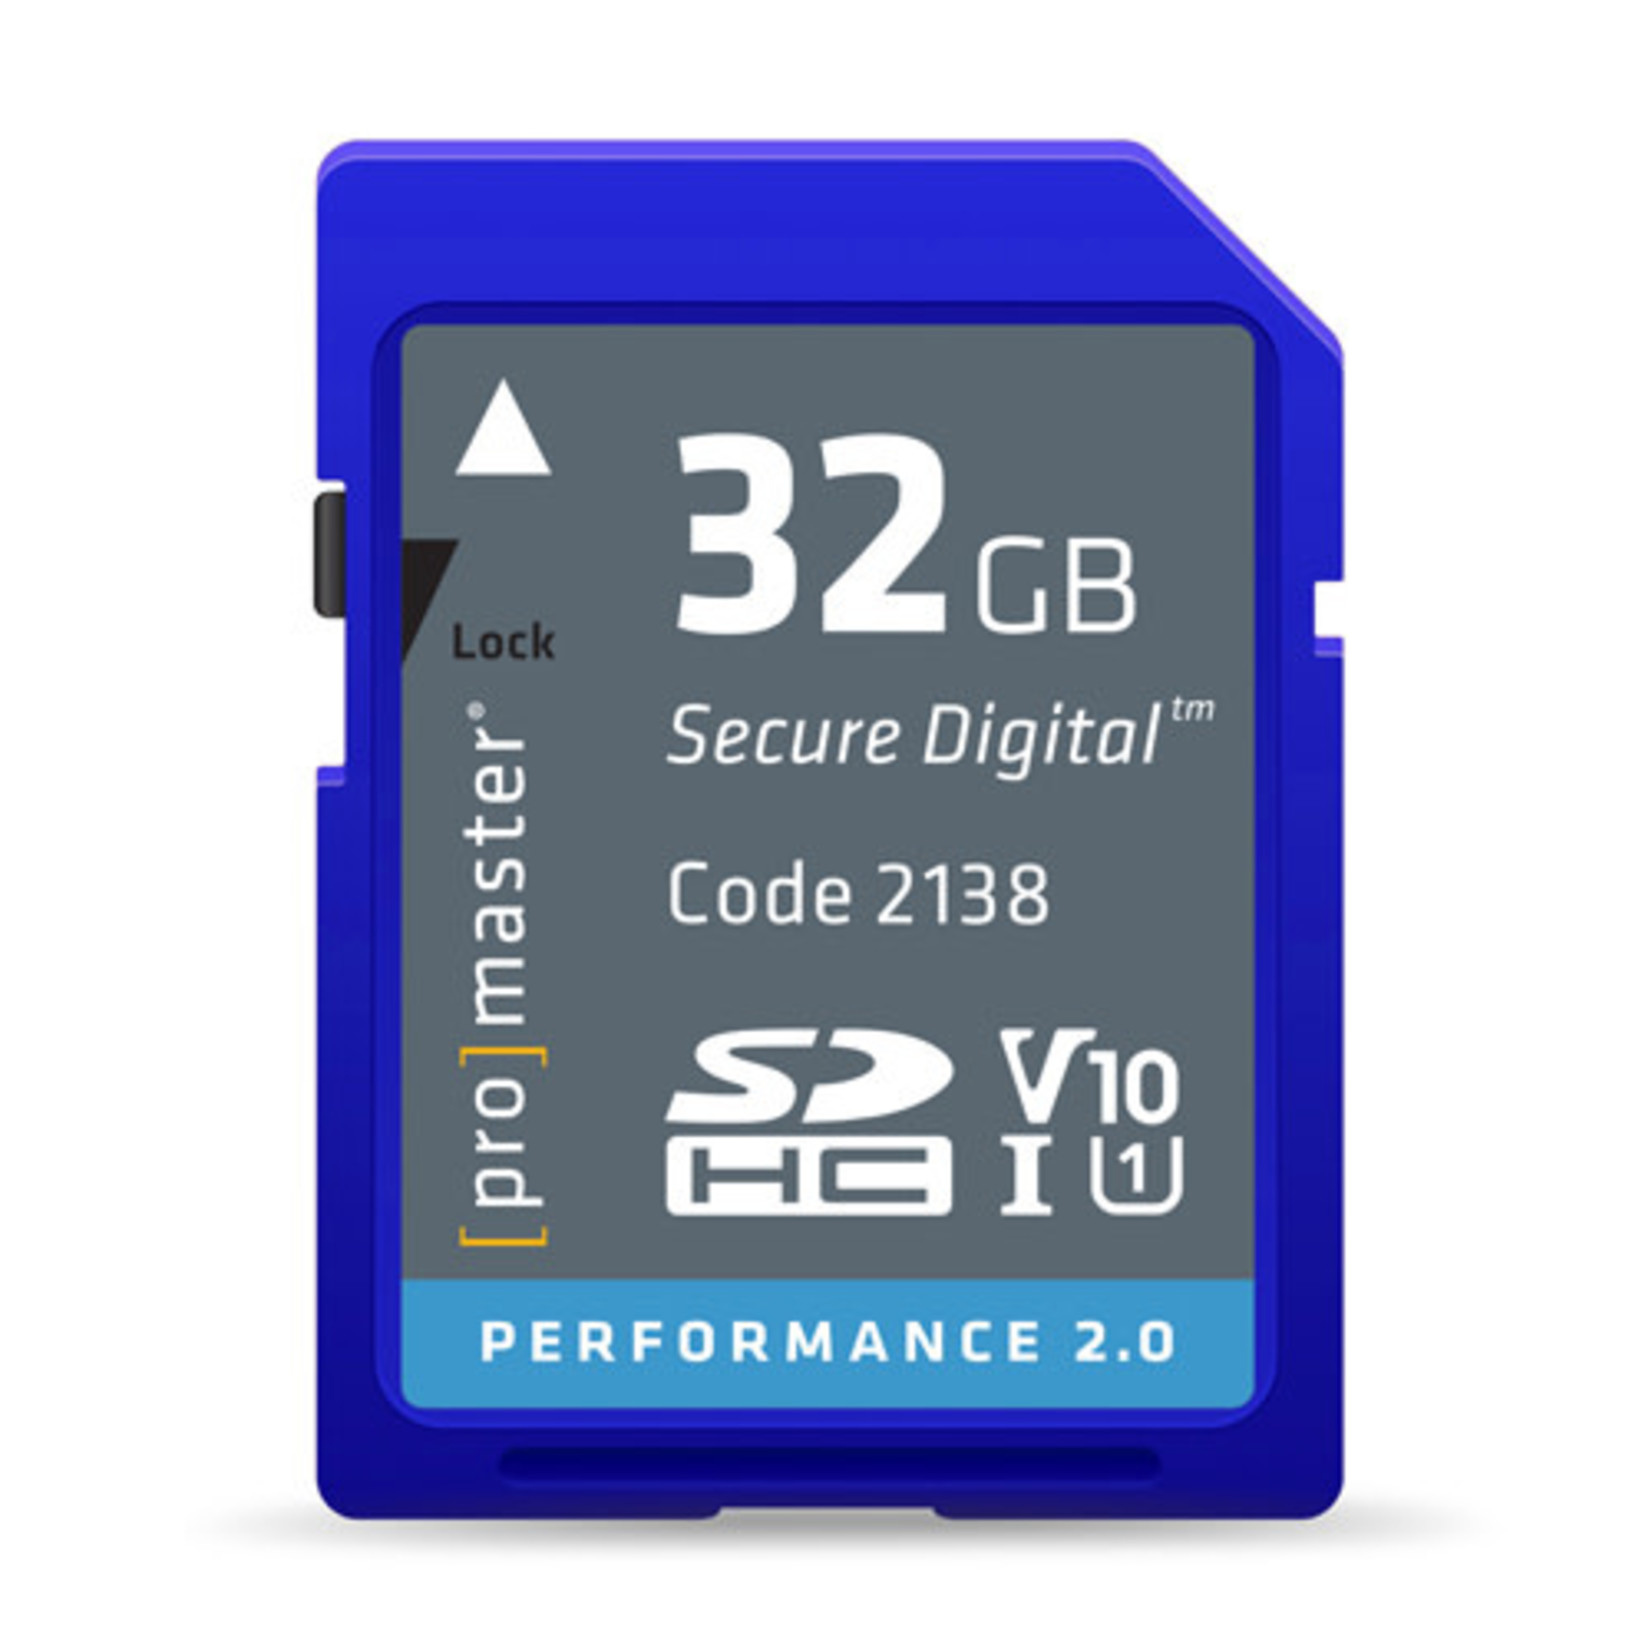 ProMaster SDHC 32GB Performance 2.0